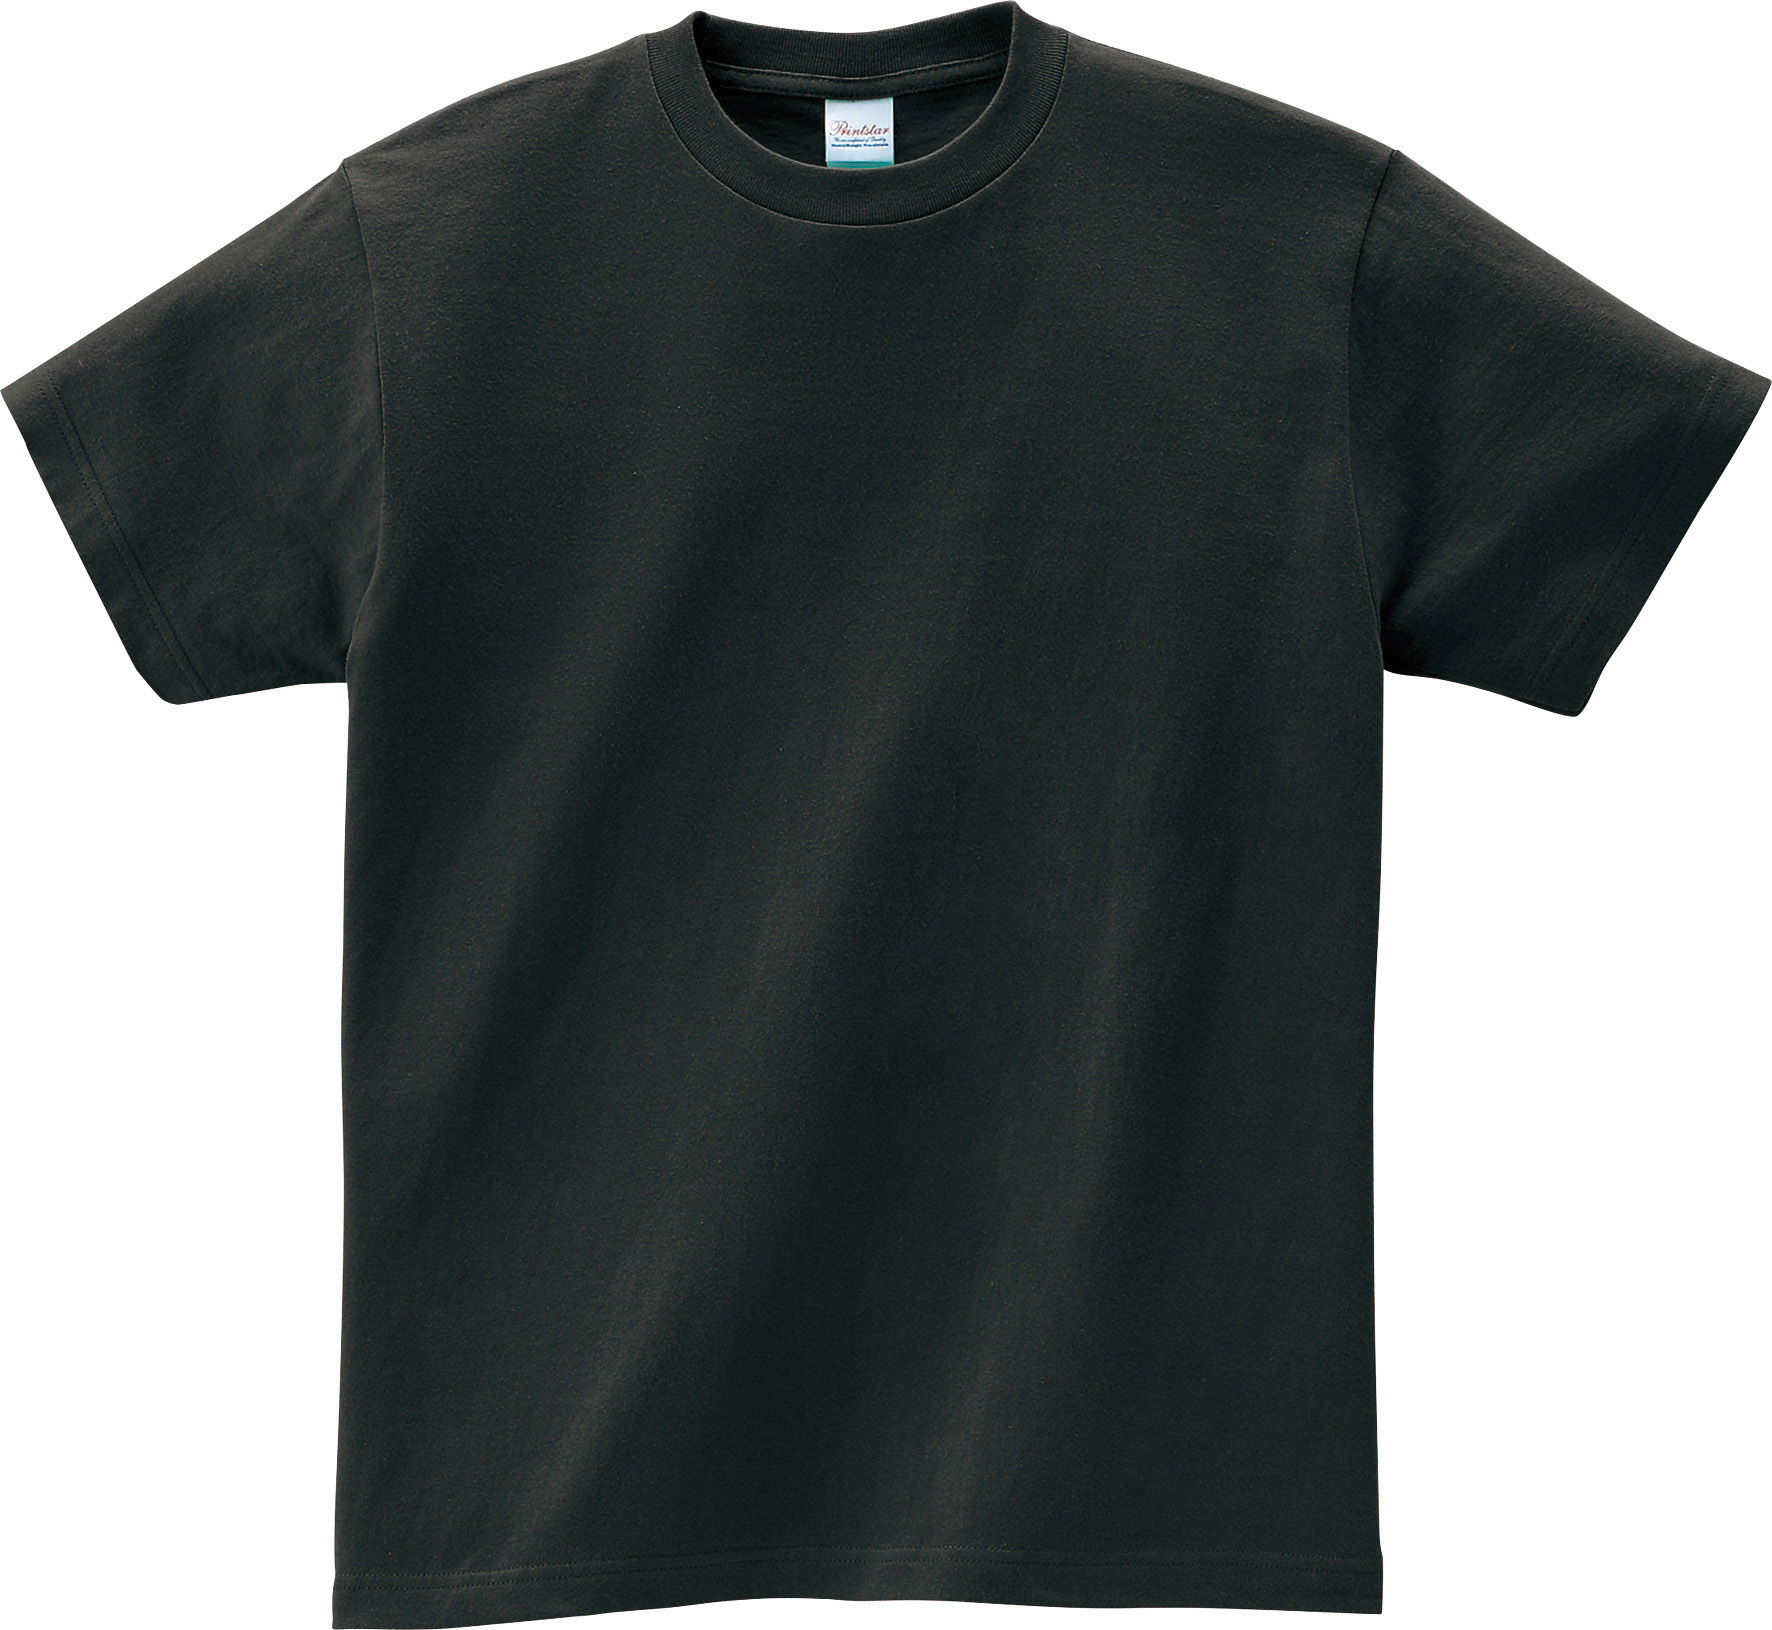 00085-CVT 5.6オンス・ヘビーウェイトTシャツ - 223-スモークブラック, XXXL